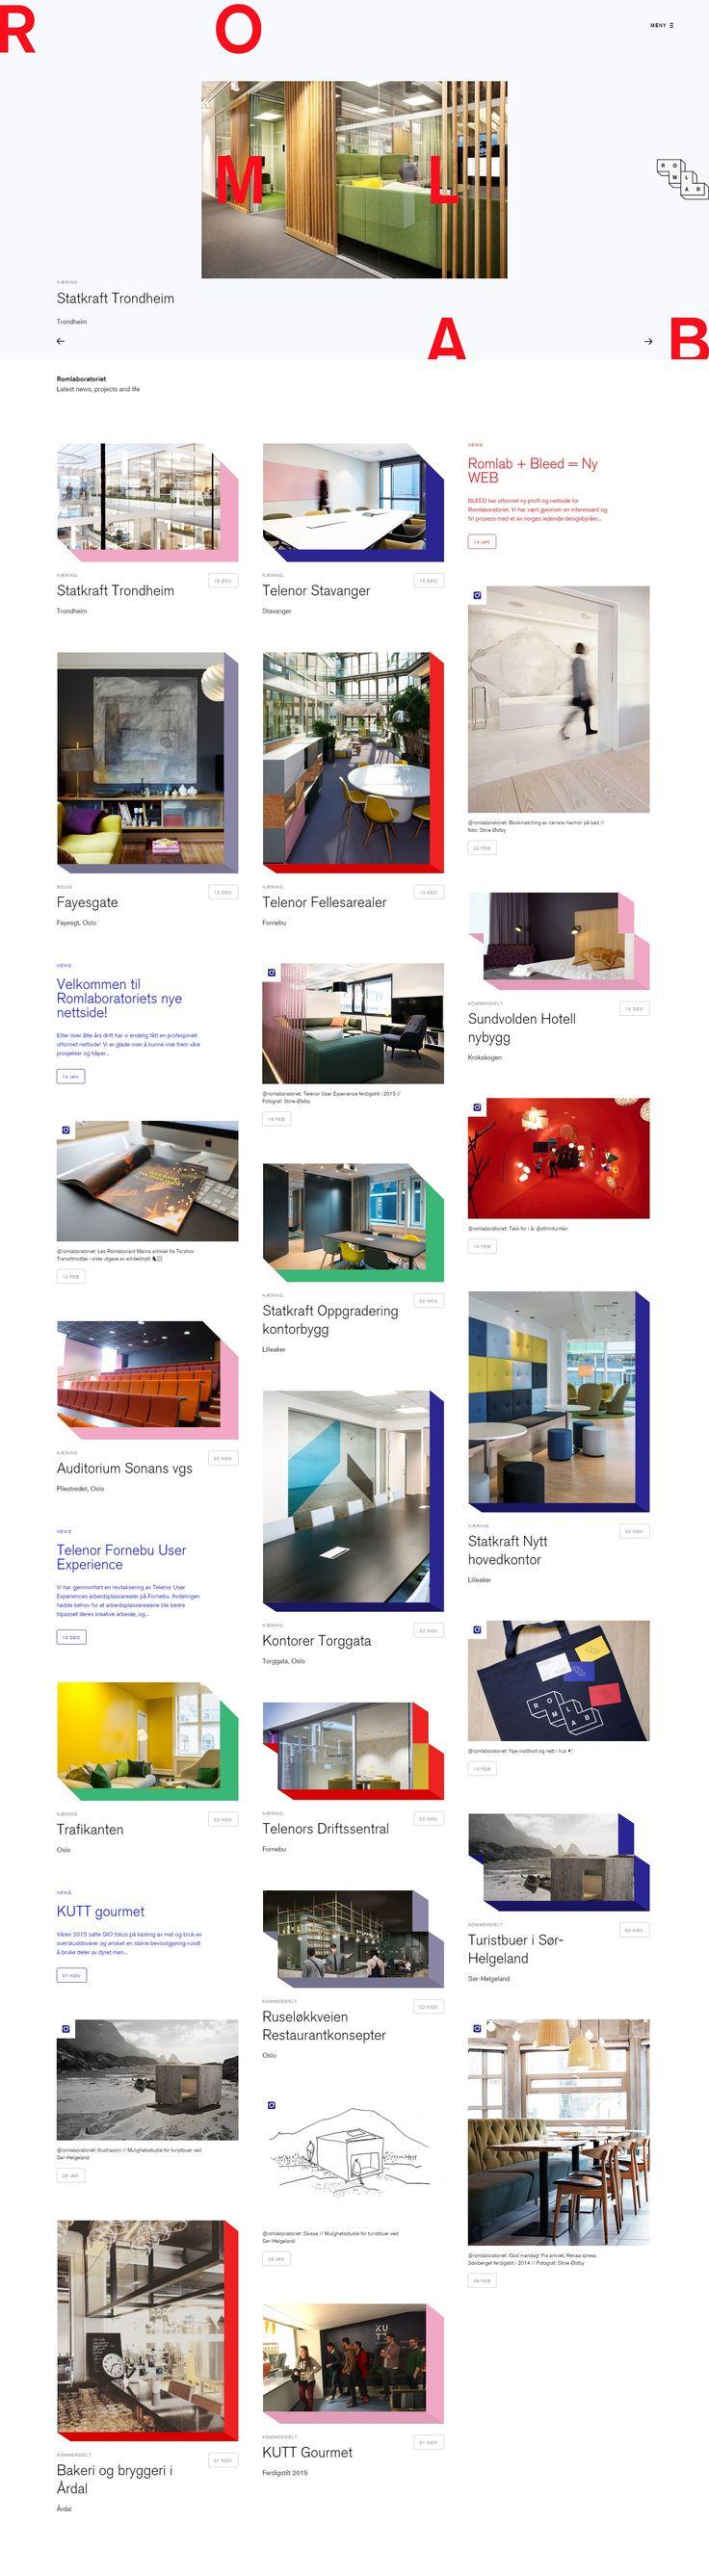 acc04e5bb88b0cb9e439cde7dc95103c--app-design-webdesign Frais De toile Parasol Concept